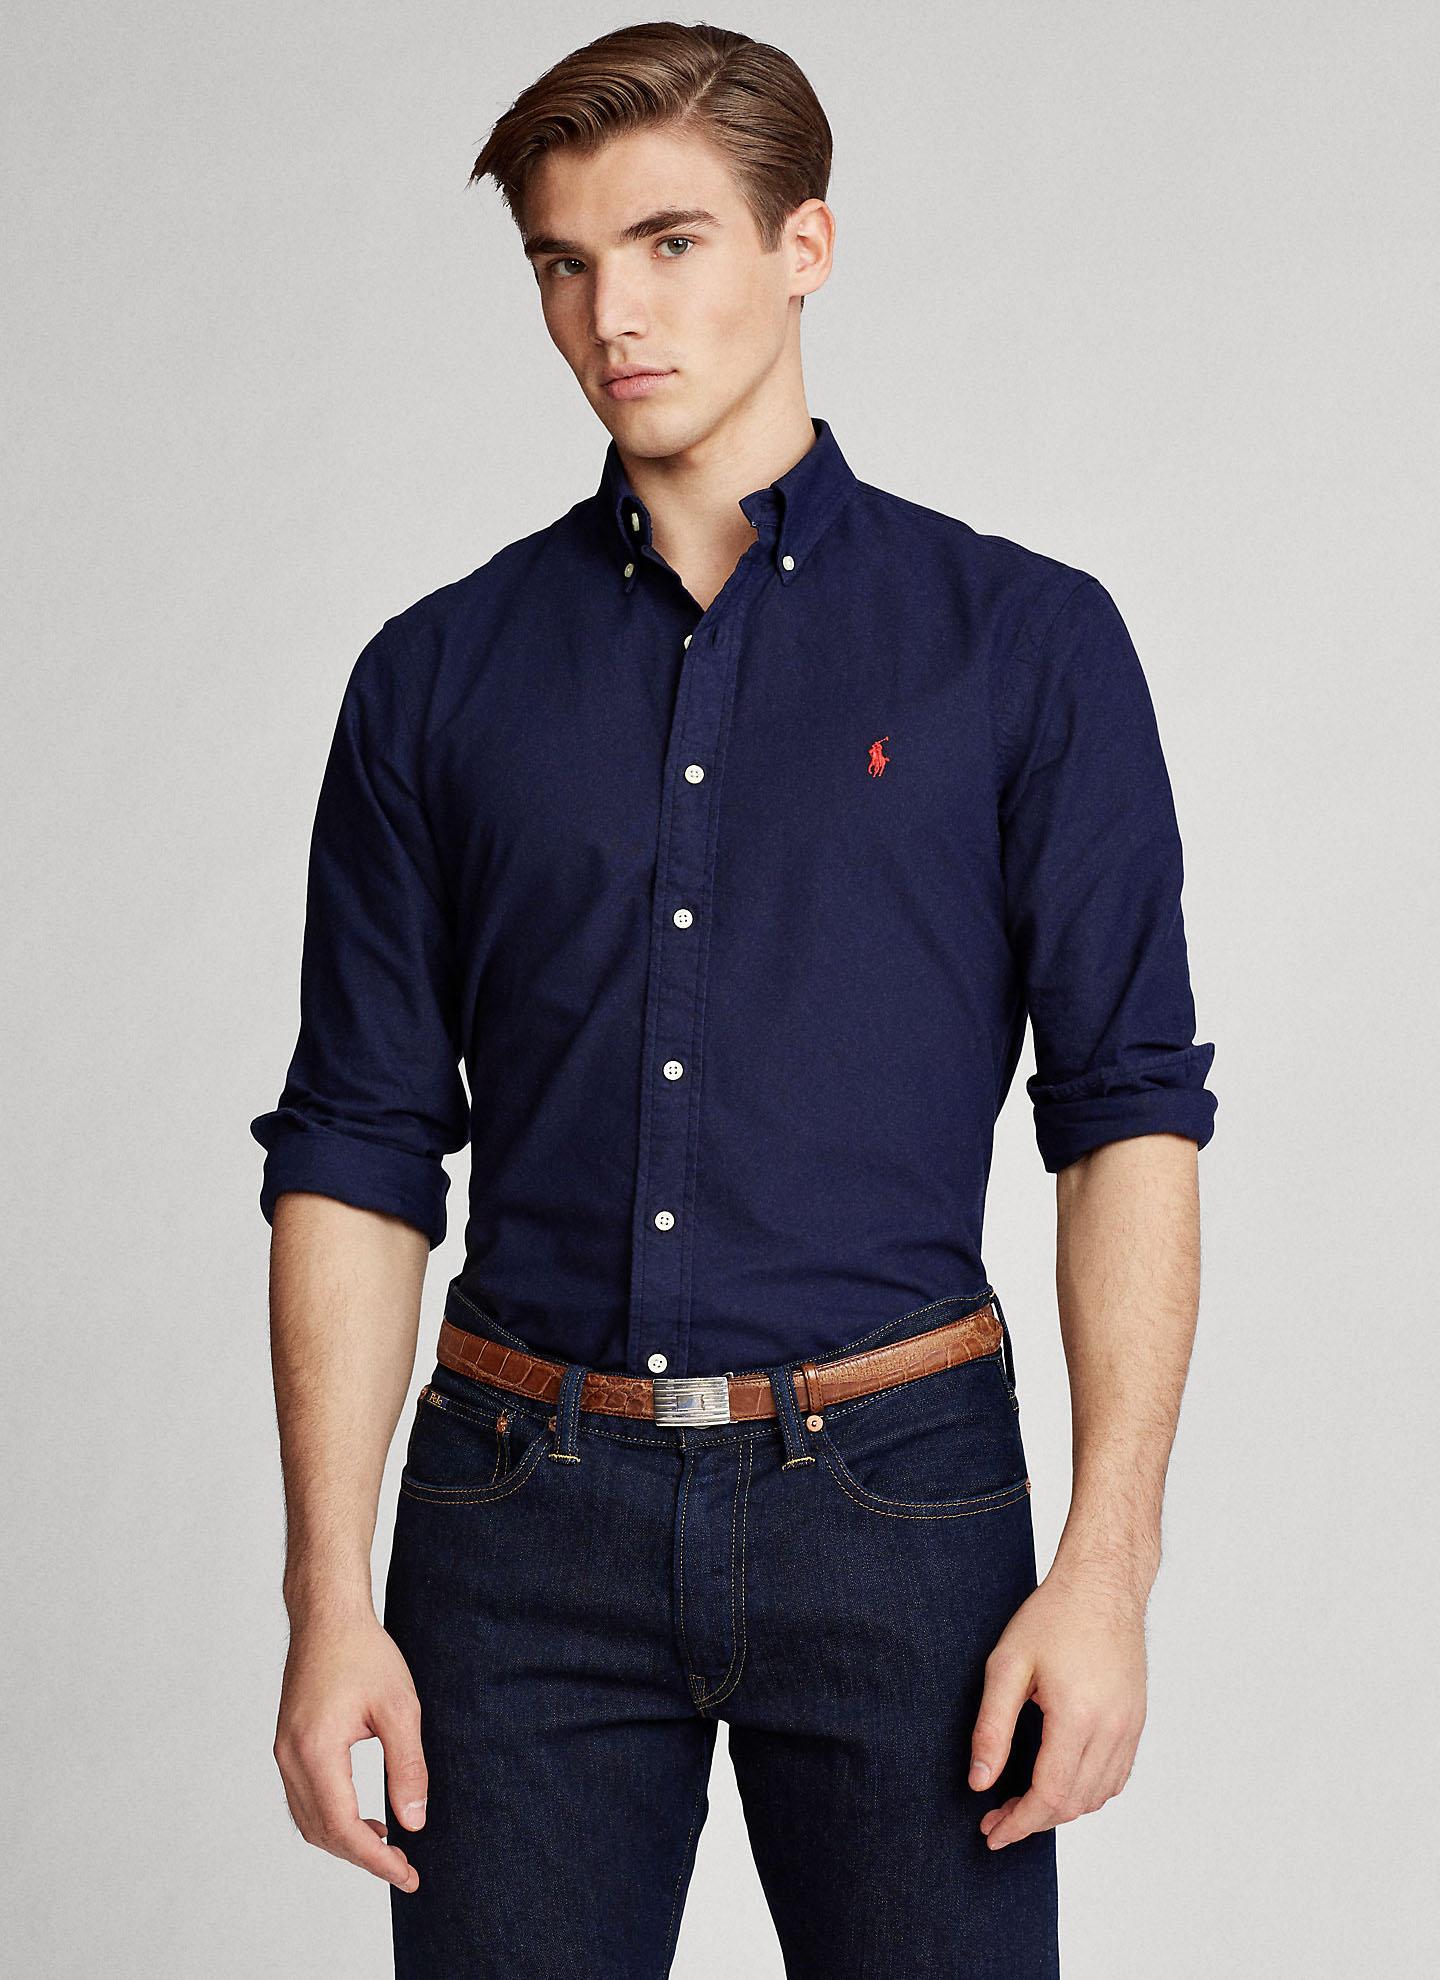 Camisa Ralph Lauren Masculina Custom Fit Gingham Oxford Azul Marinho